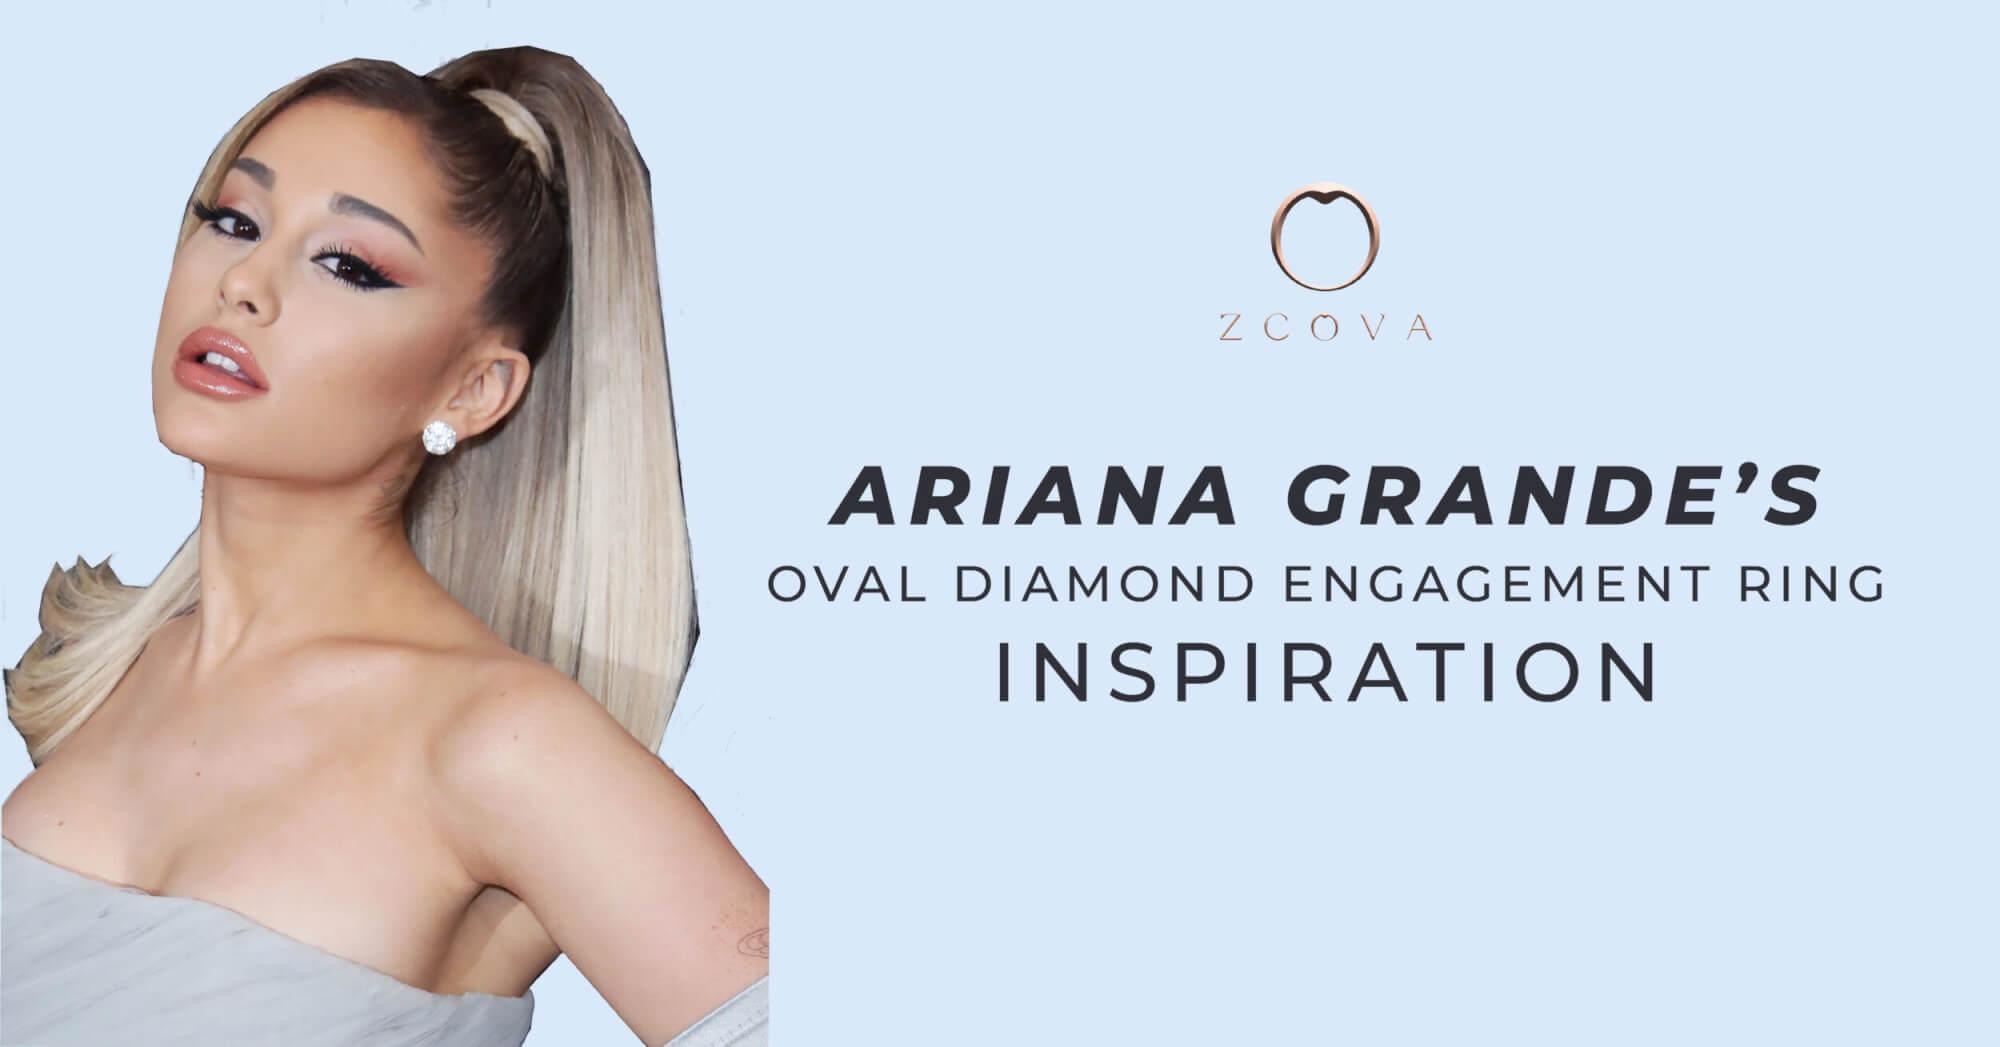 Ariana Grande Oval Diamond Engagement Ring Inspiration